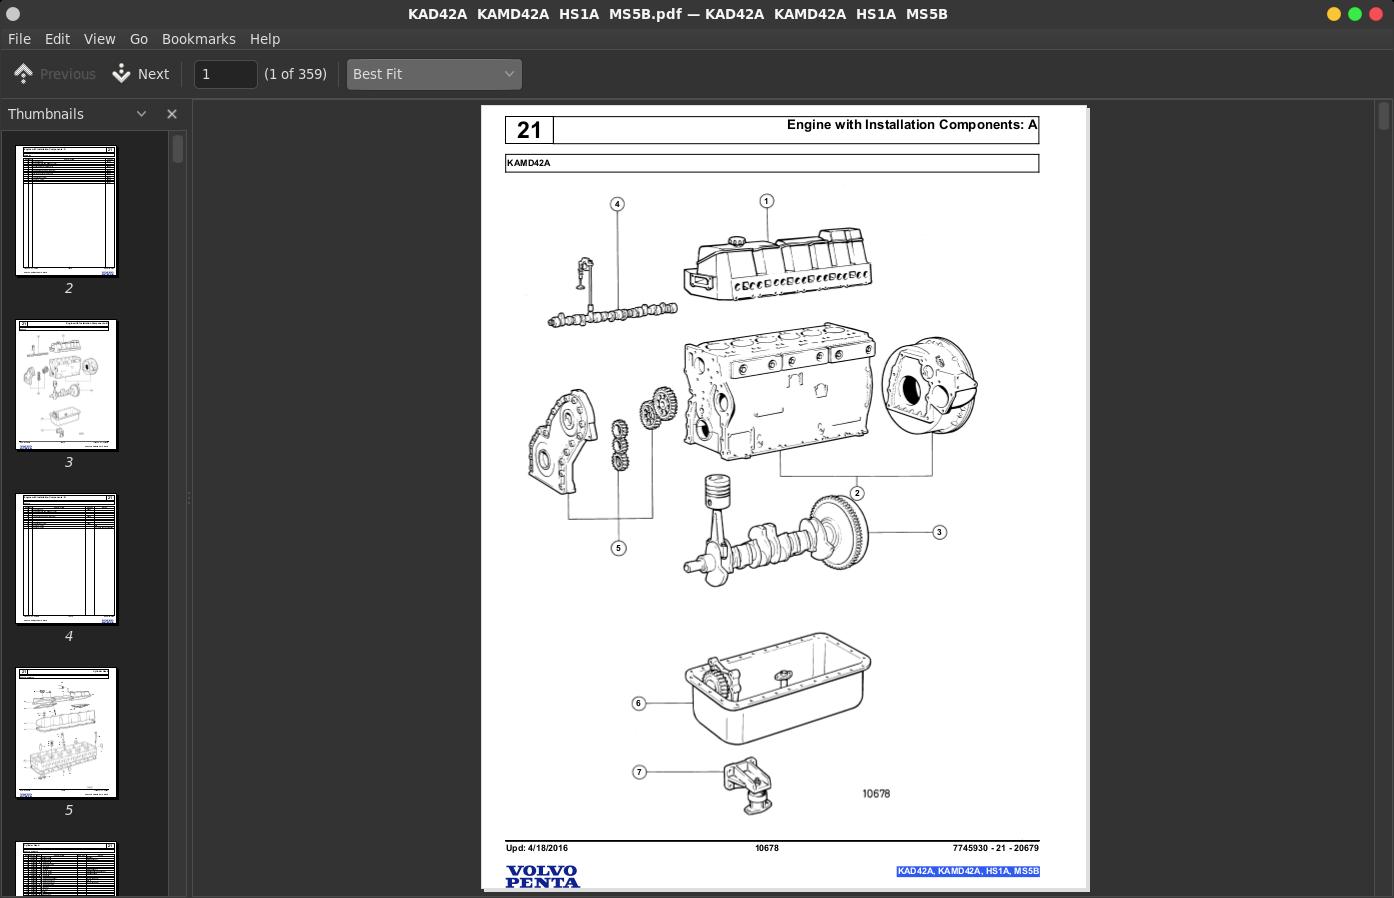 Volvo Penta Marine Diesel Engines KAD42A, KAMD42A, HS1A, MS5B Parts Catalog  Manual   A++ Repair Manual Store   Volvo Marine Diesel Engine Diagram      A++ Repair Manual Store